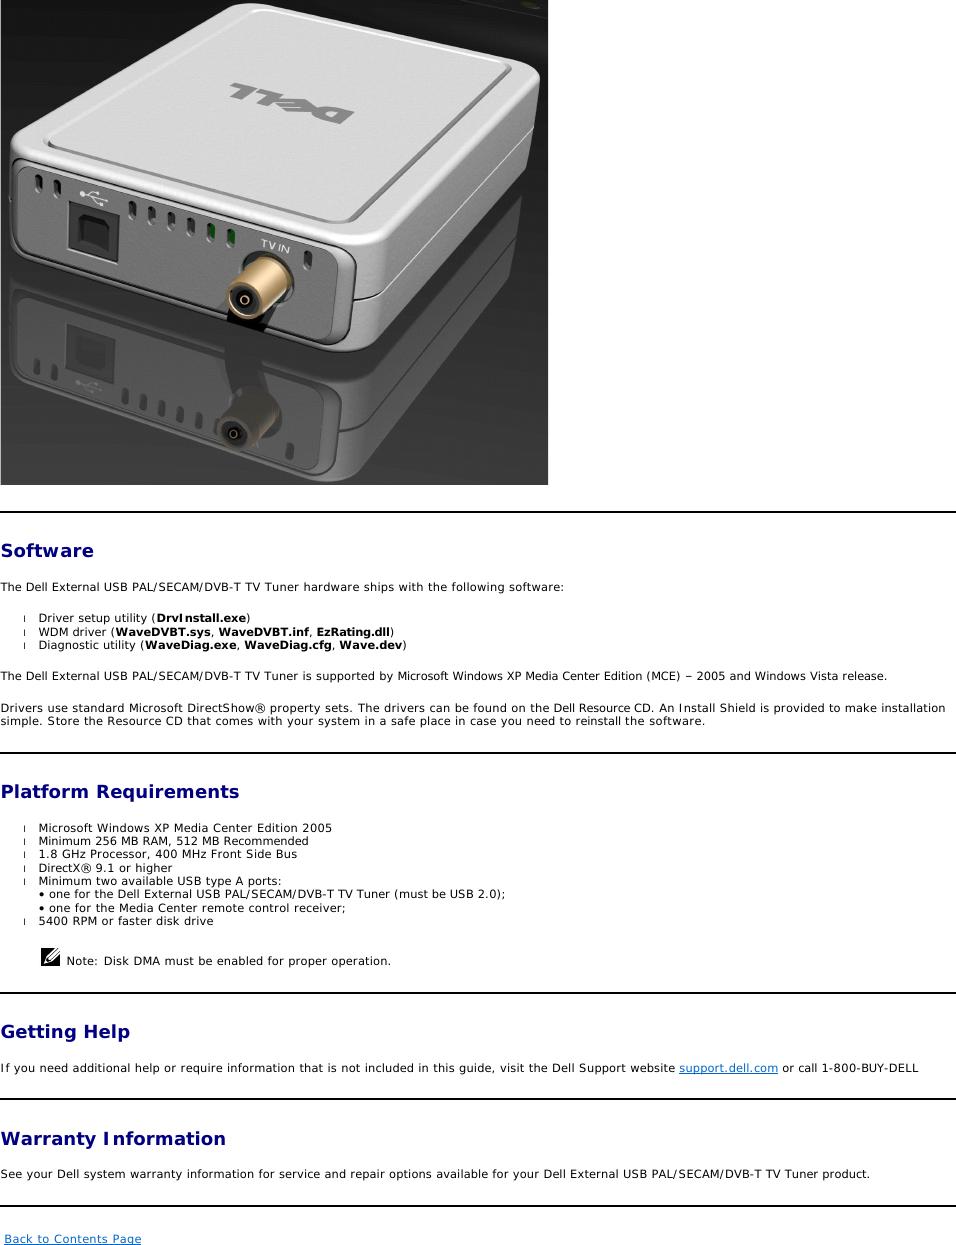 Dell External Usb Pal Secam Dvb T Tv Tuner Owners Manual PAL/SECAM ...